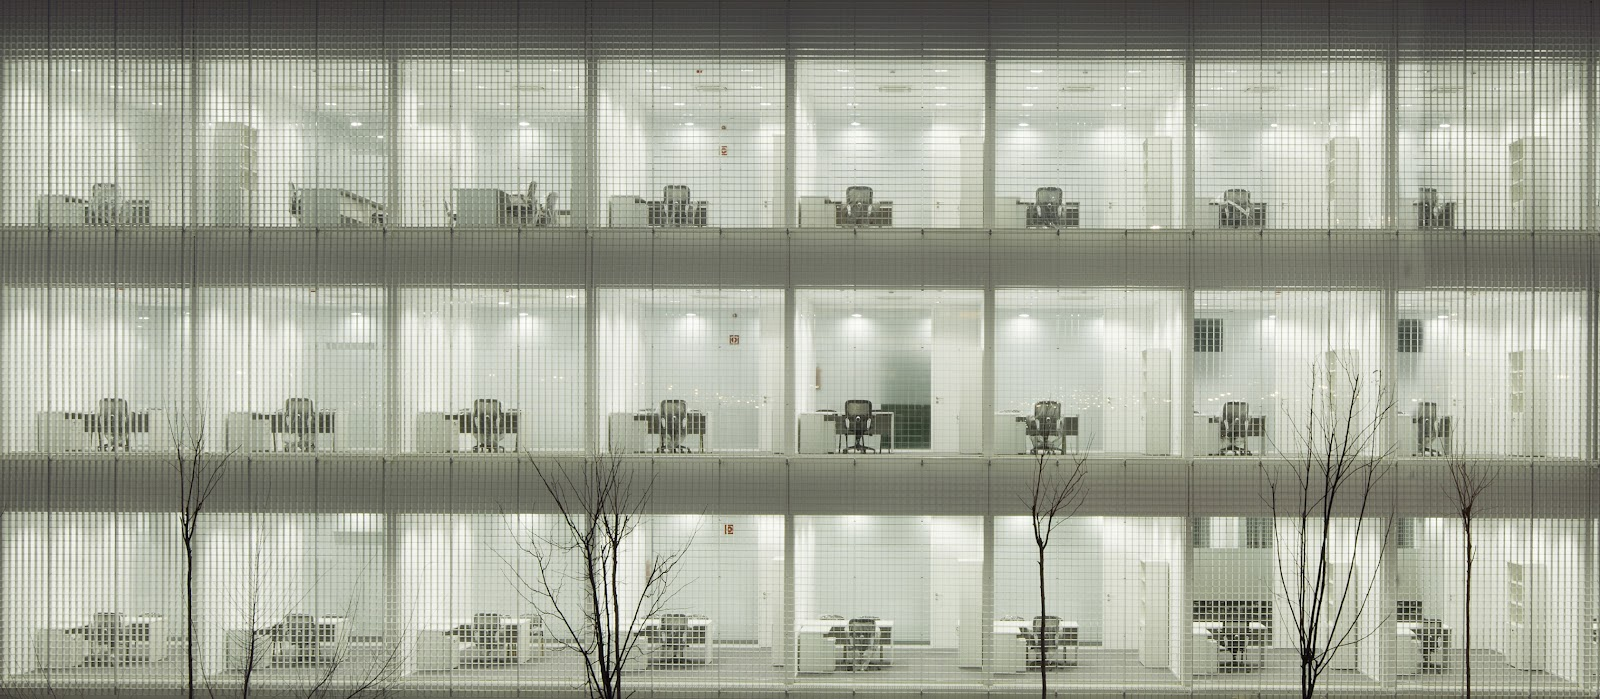 Dosmasunoarquitectos for Portadas de arquitectura